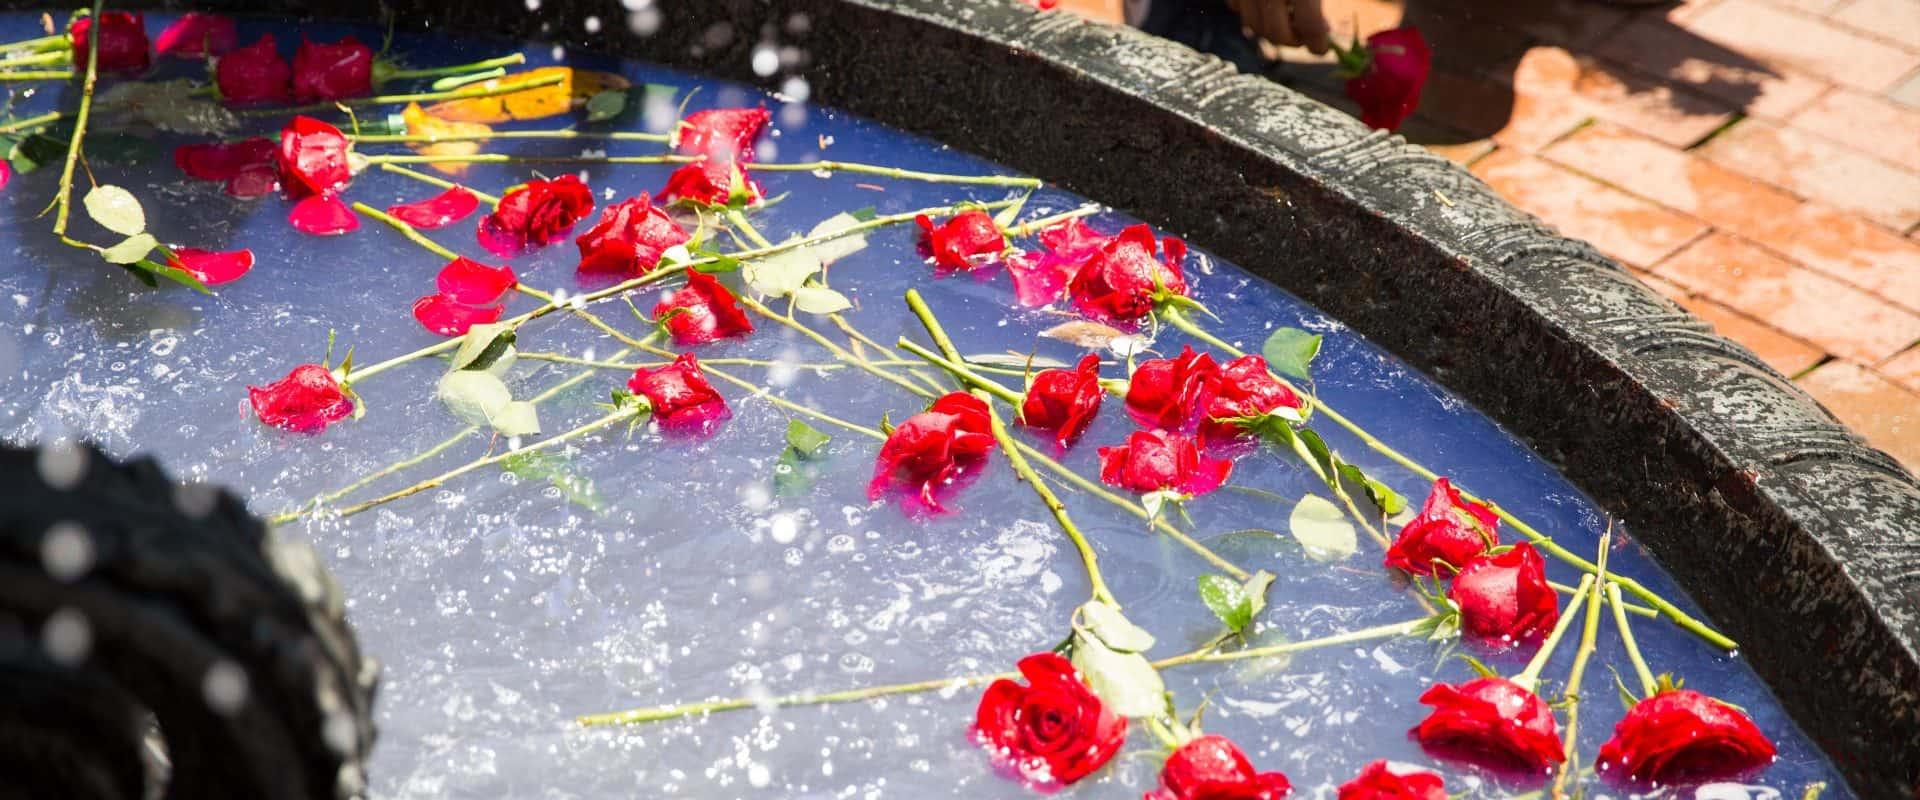 Roses in Main Fountain.